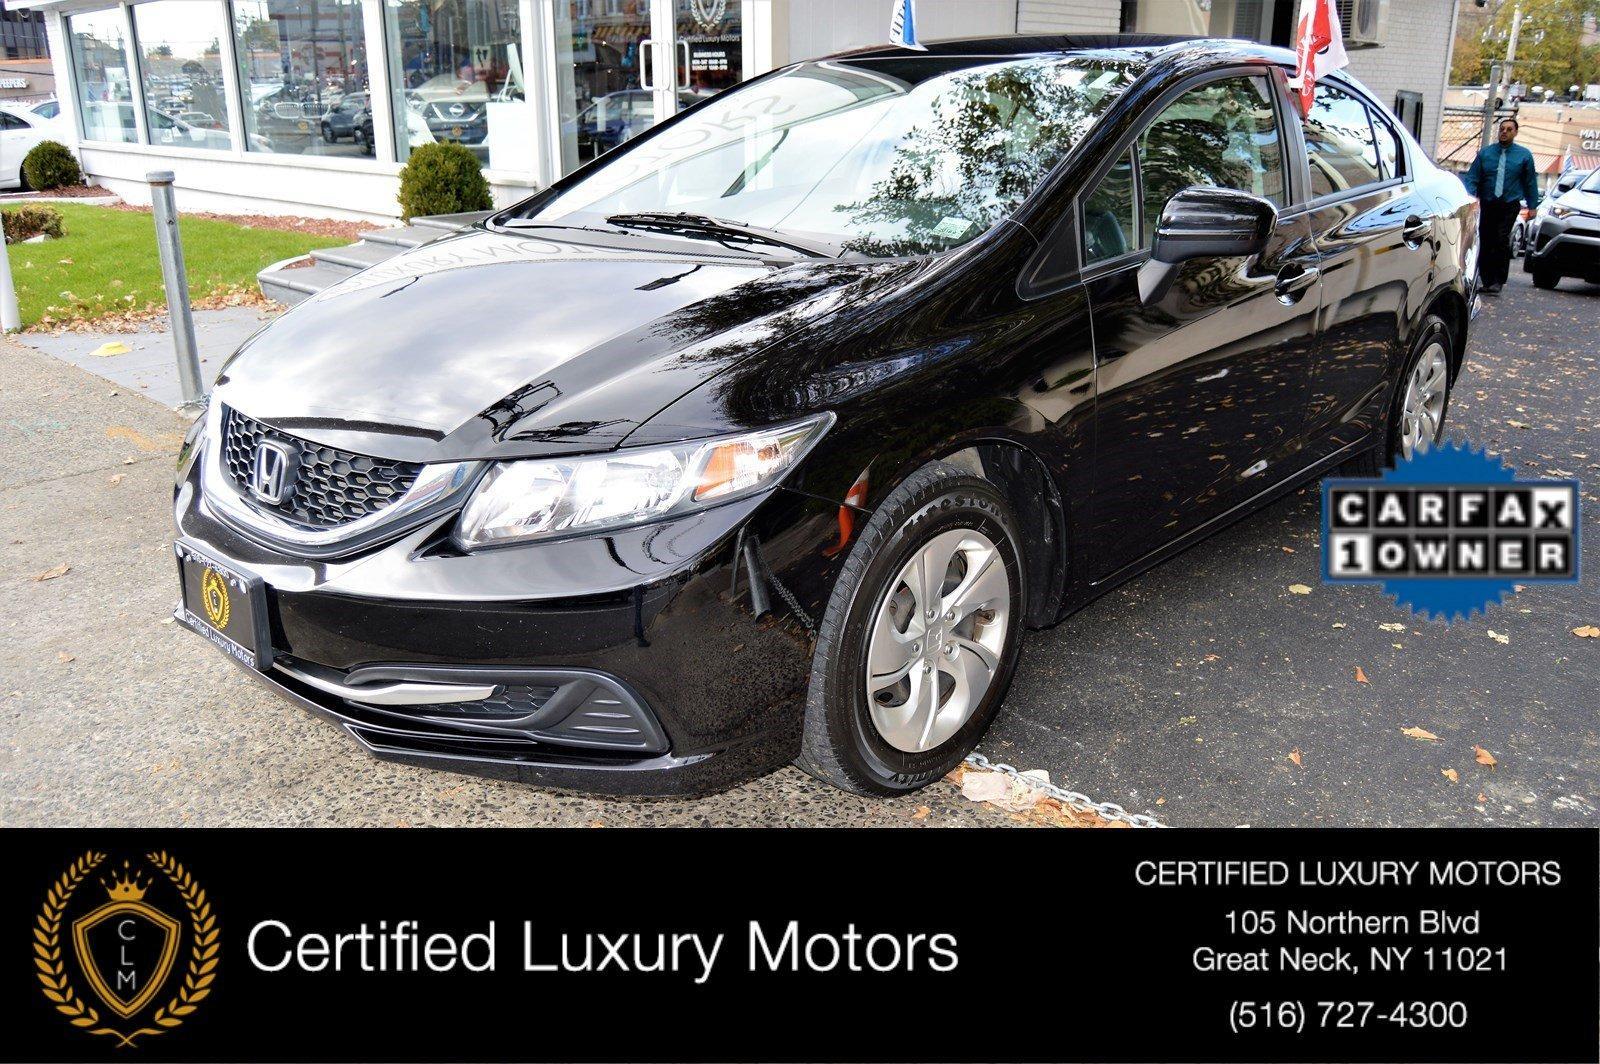 2015 honda civic sedan lx stock 4091 for sale near great for Honda northern blvd